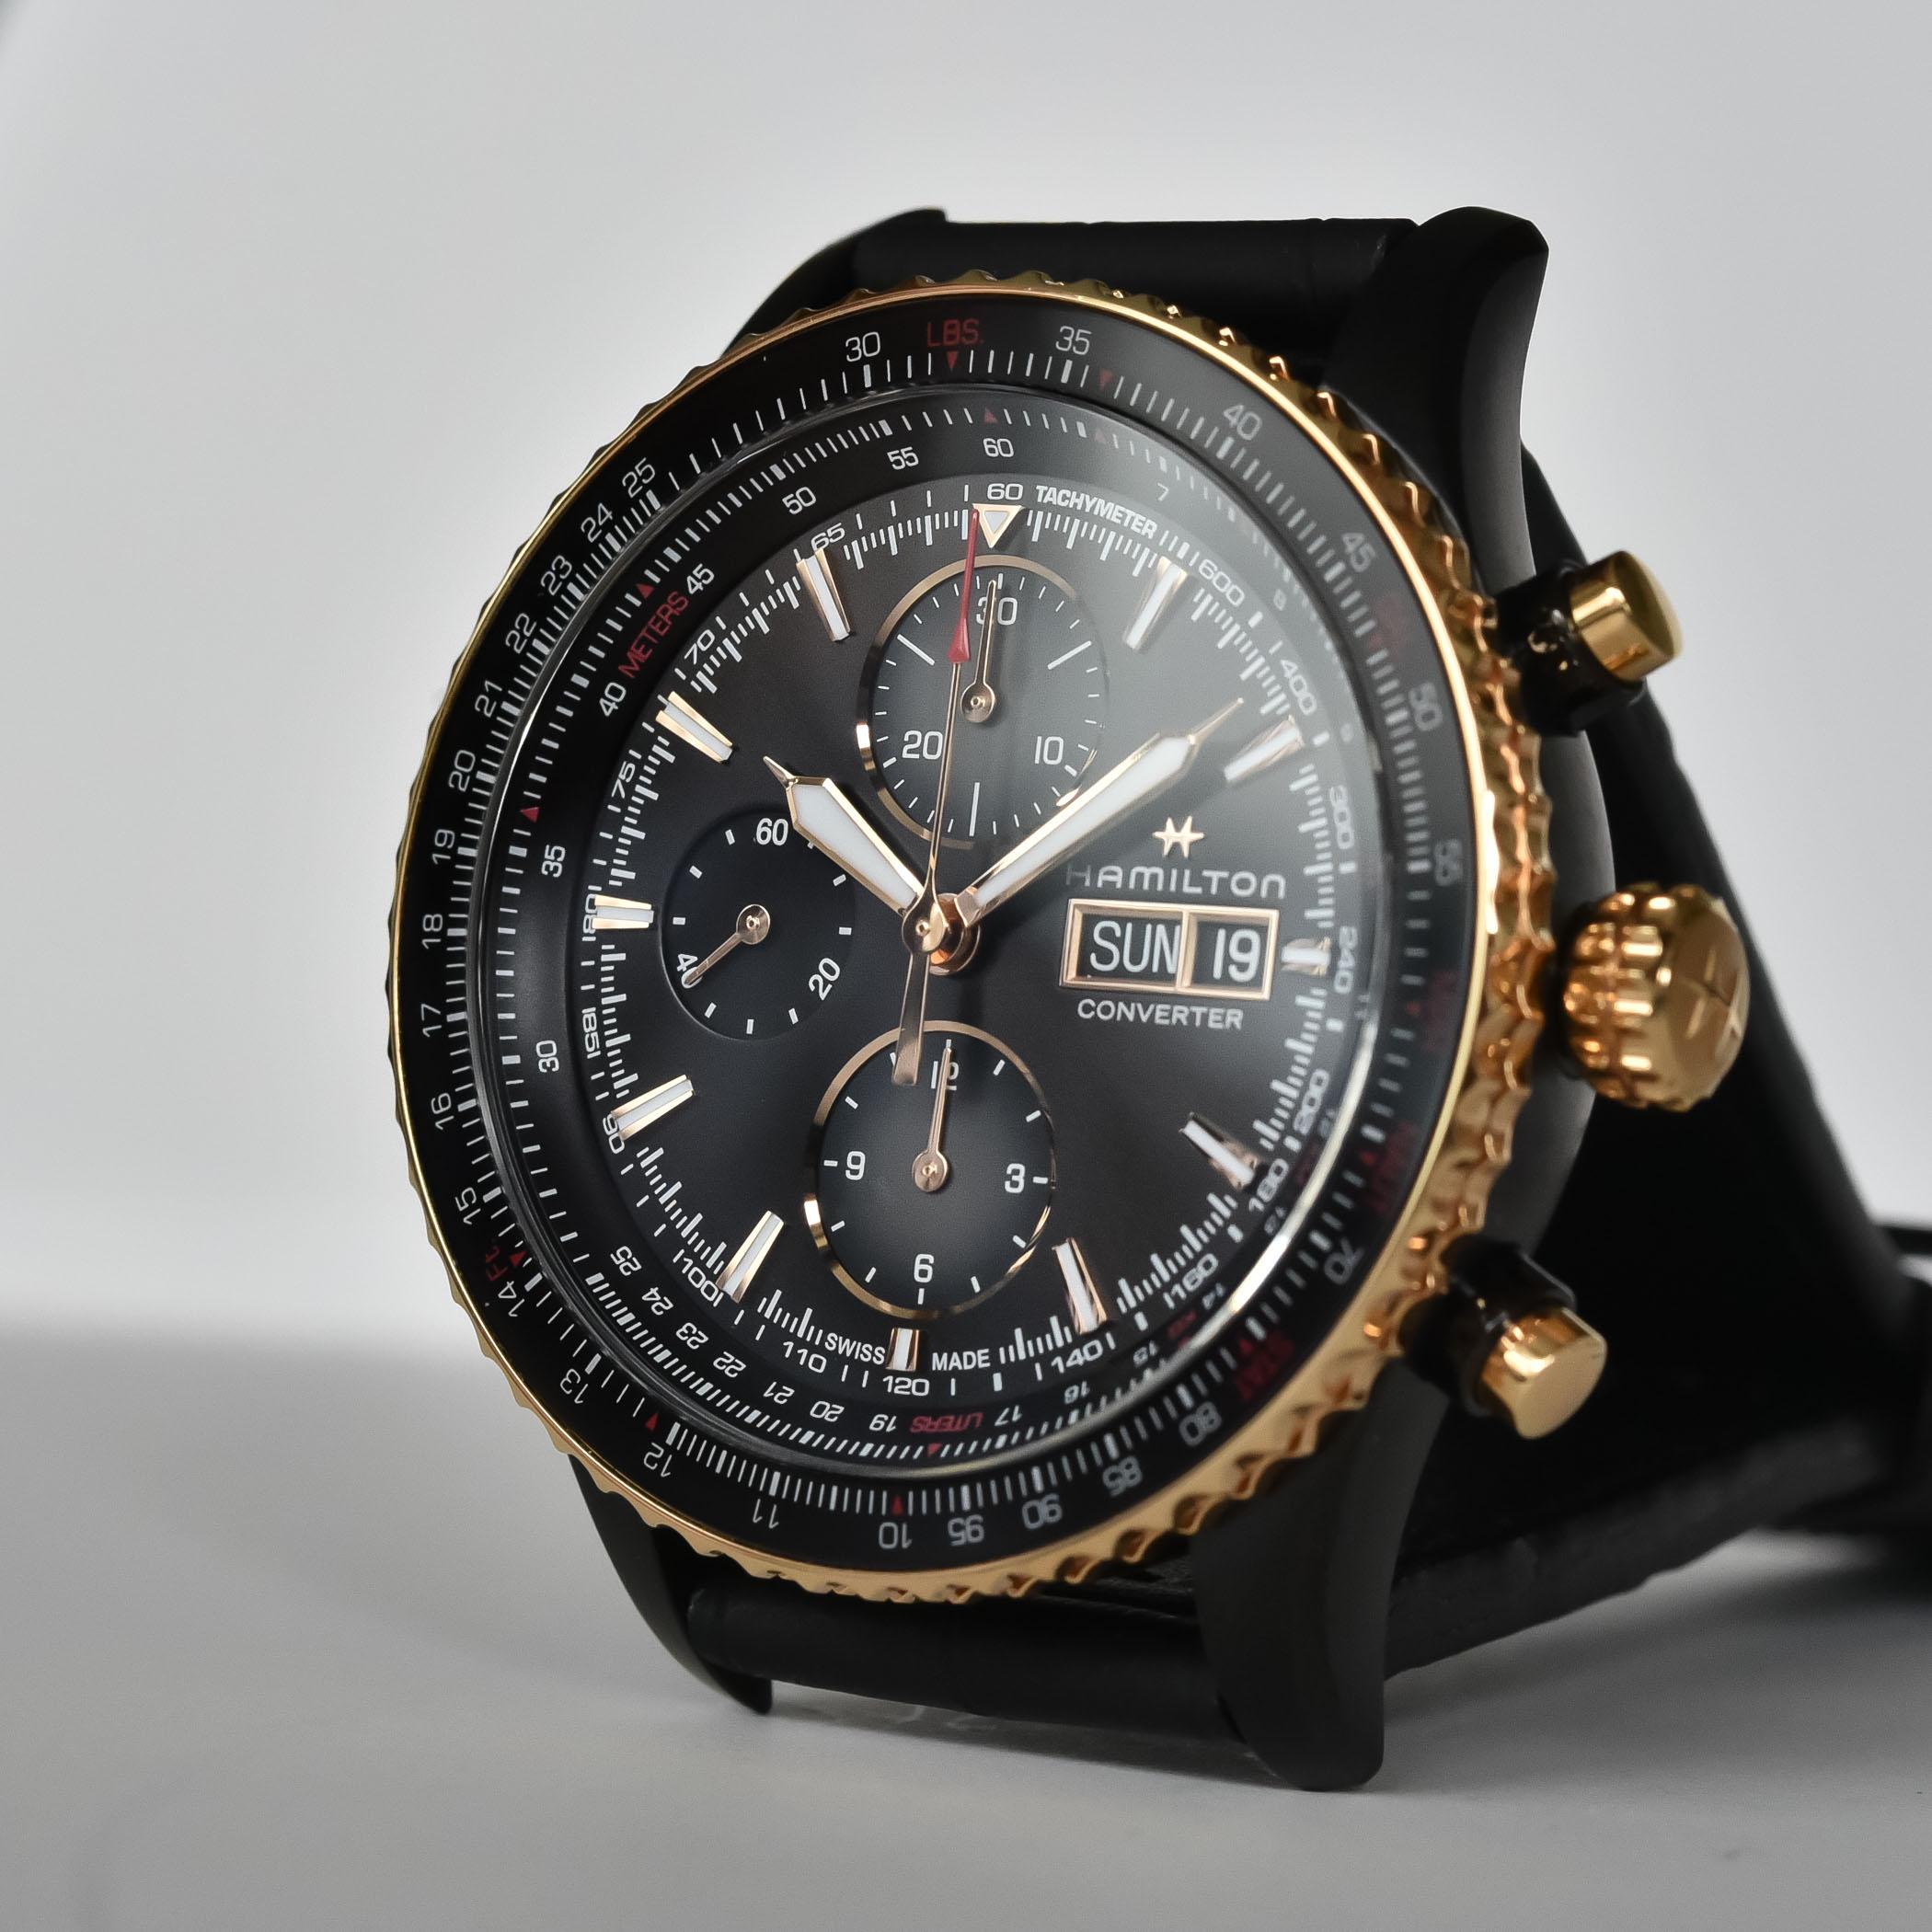 Hamilton Khaki Aviation Converter Automatic Chronograph Black and gold - H76736730 - 3